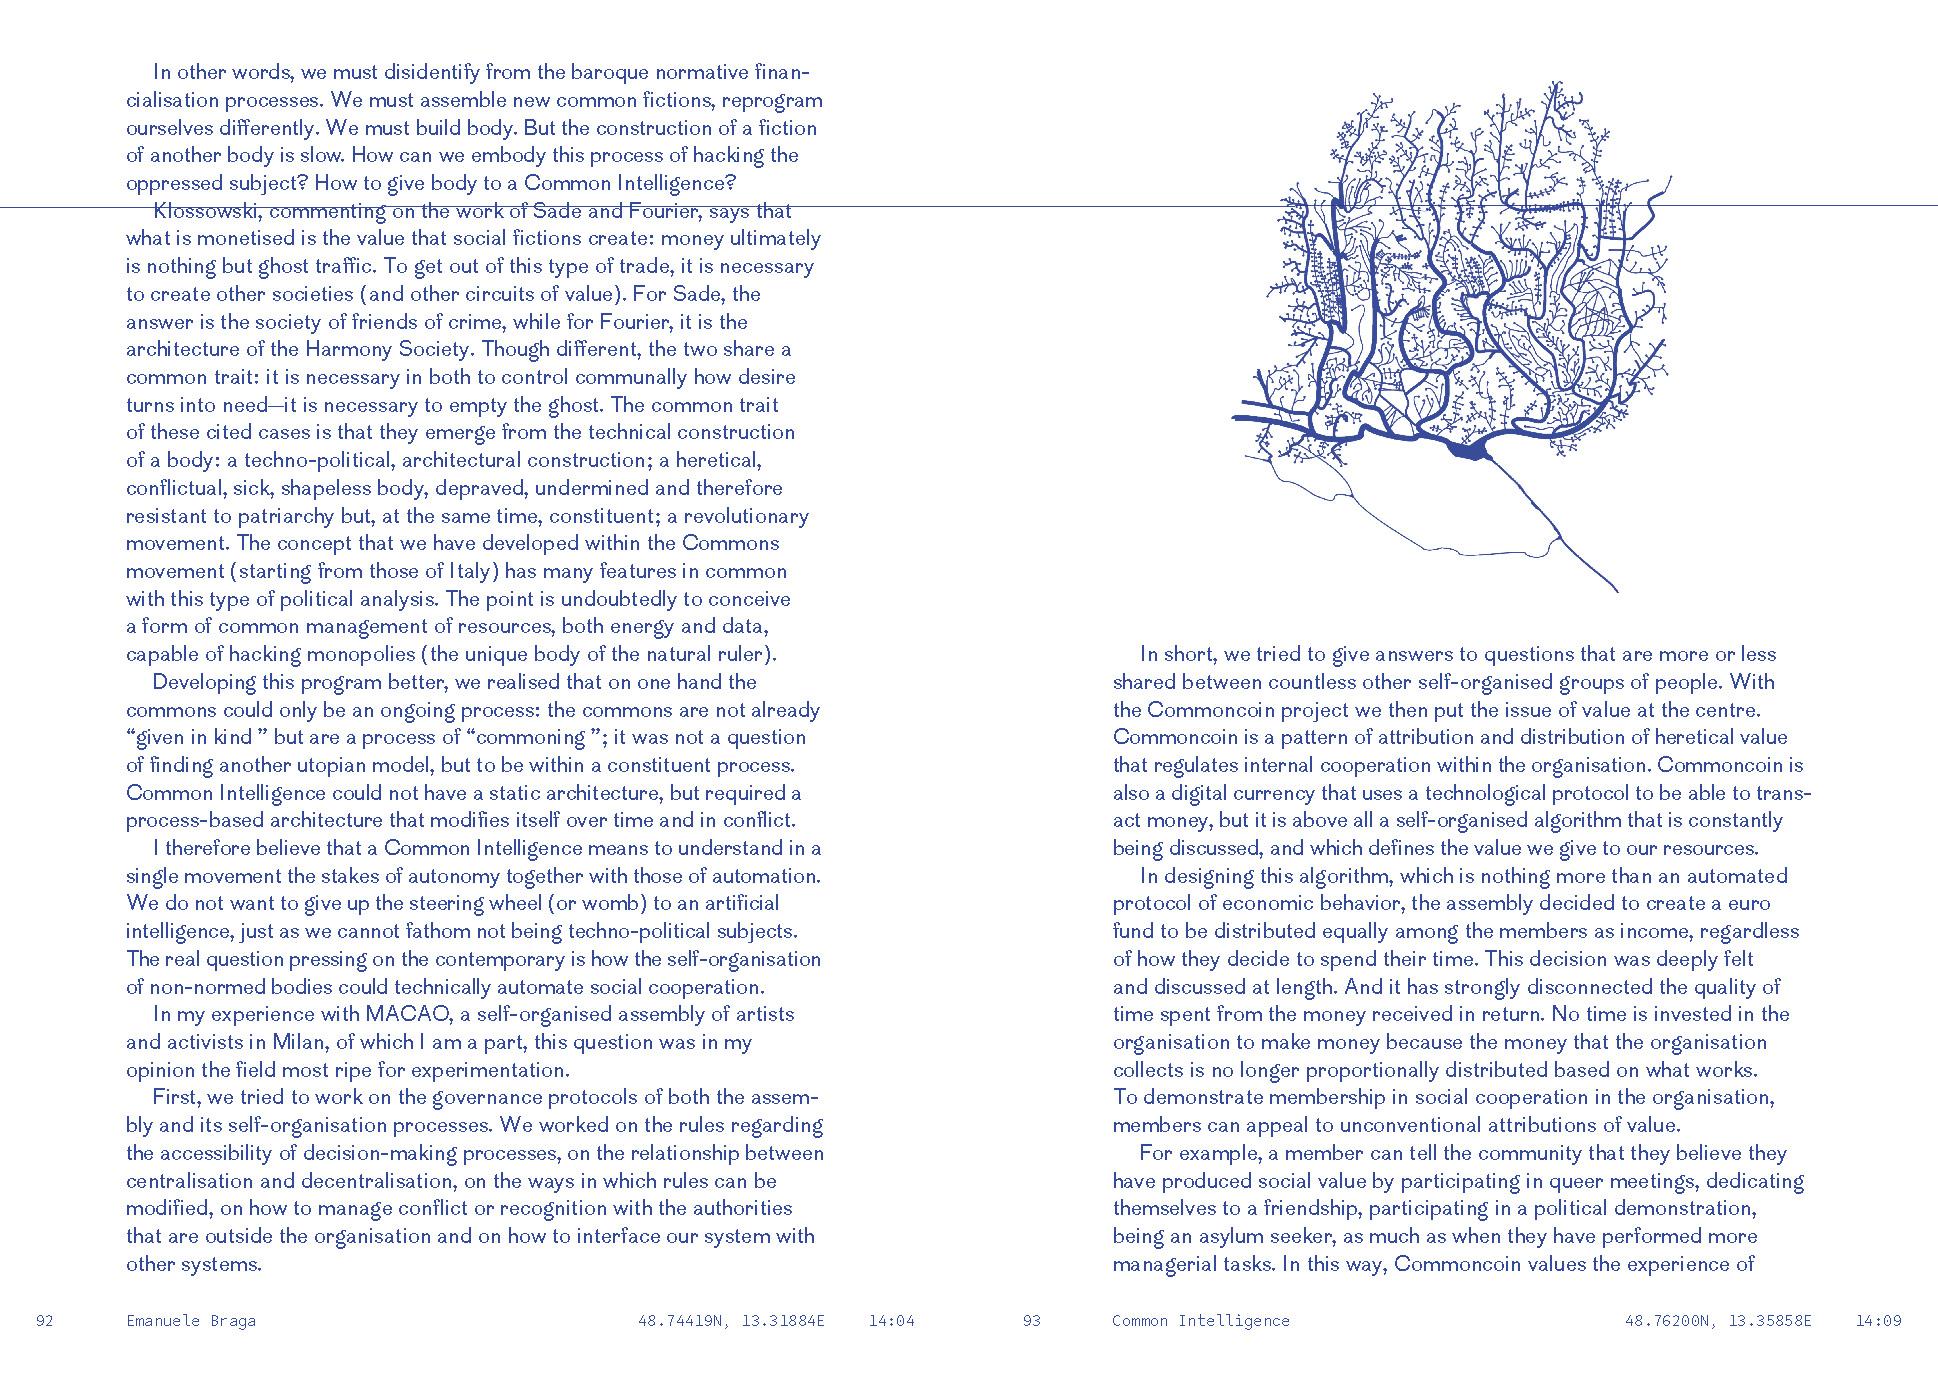 20AE_MovementsfortheAir_Aerocene (1)_Page_047